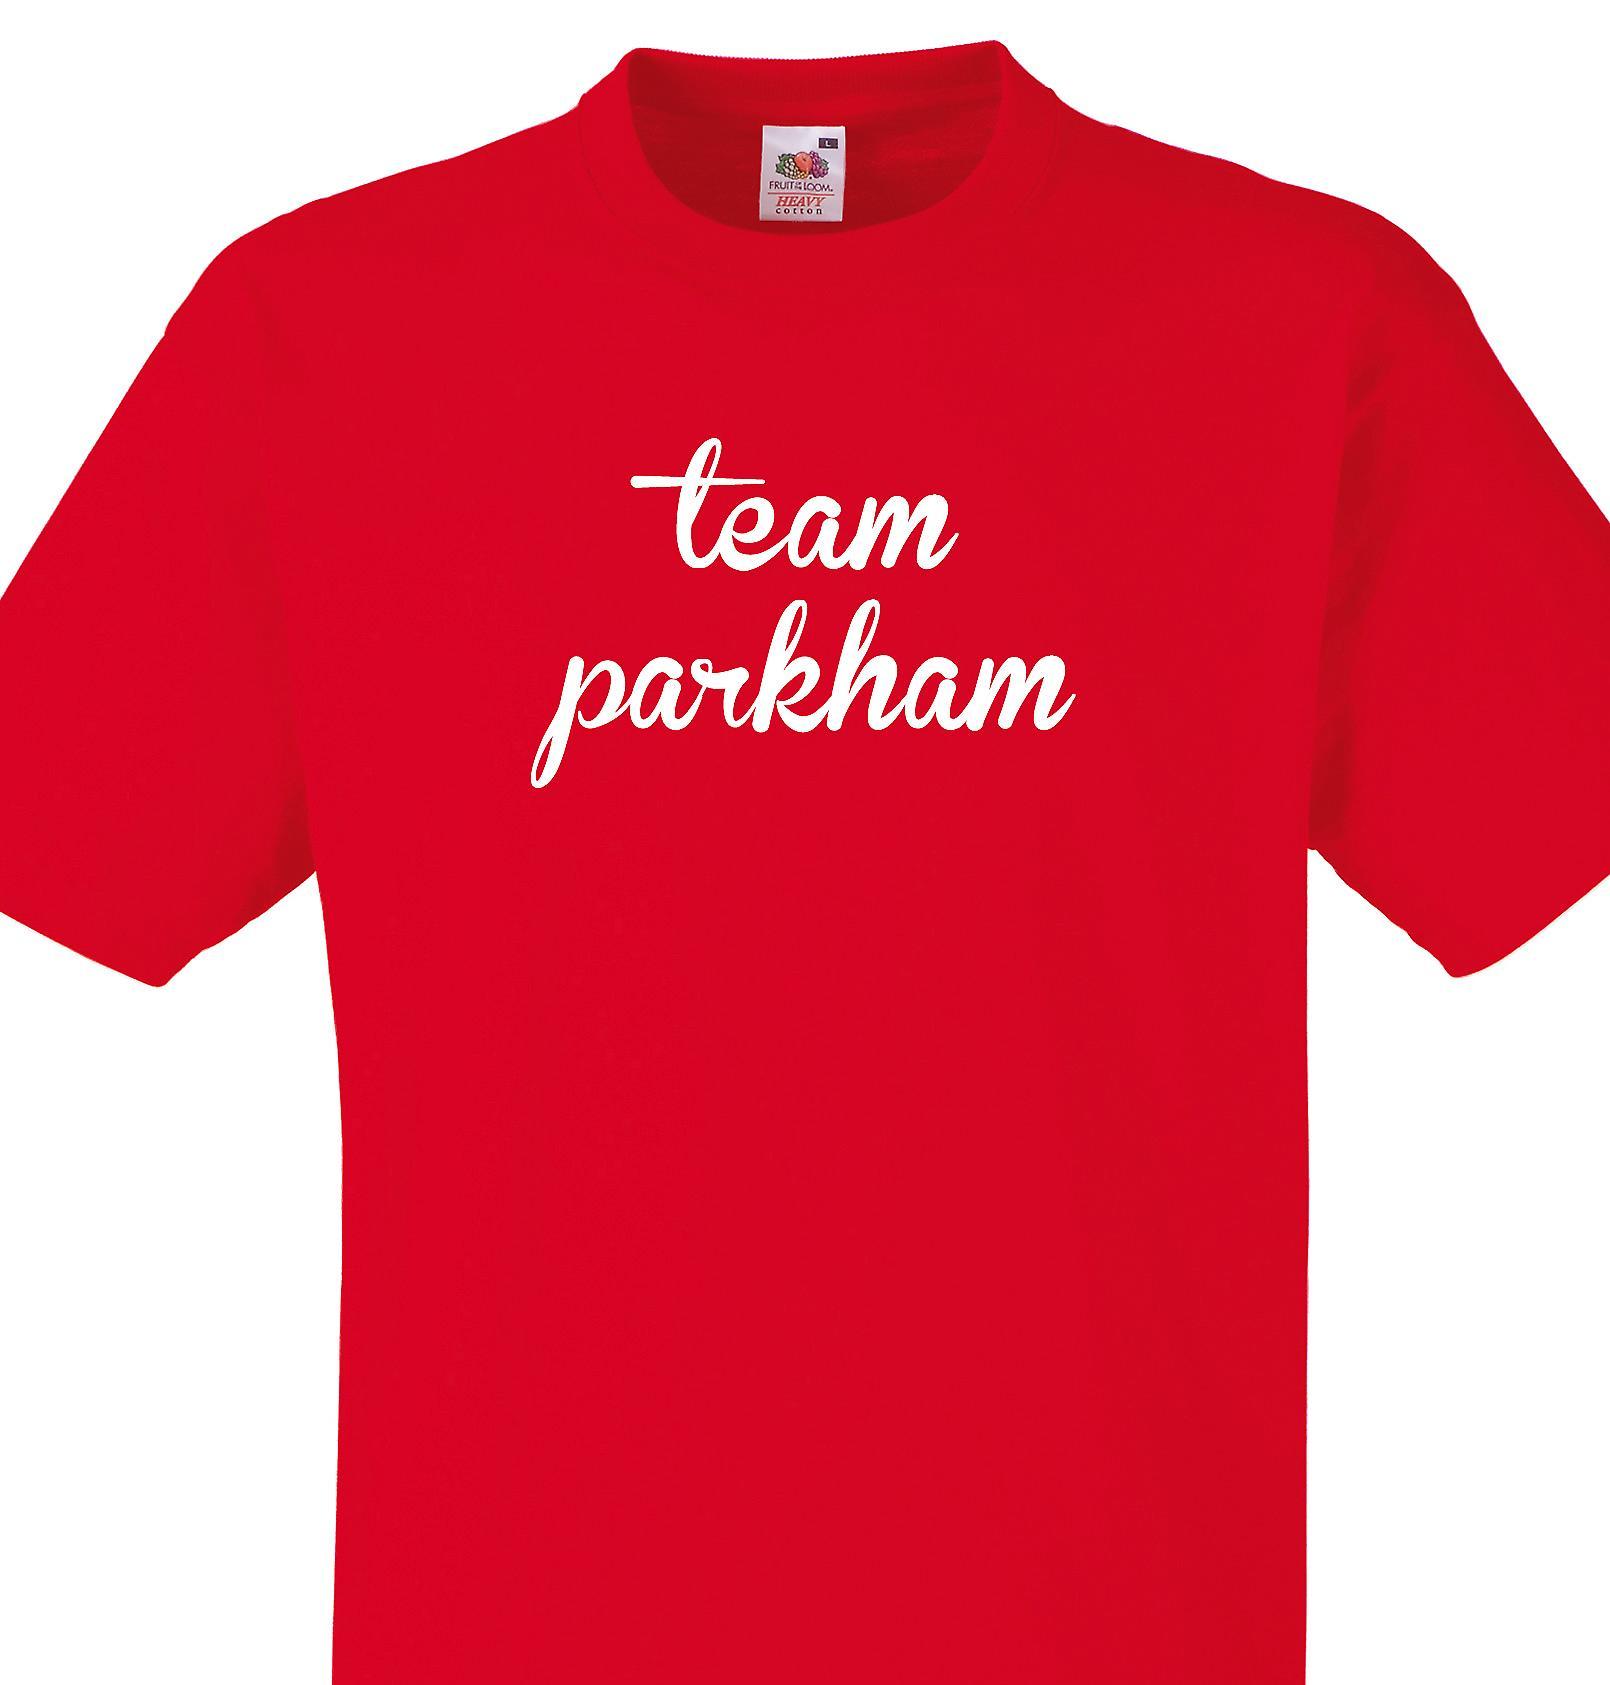 Team Parkham Red T shirt